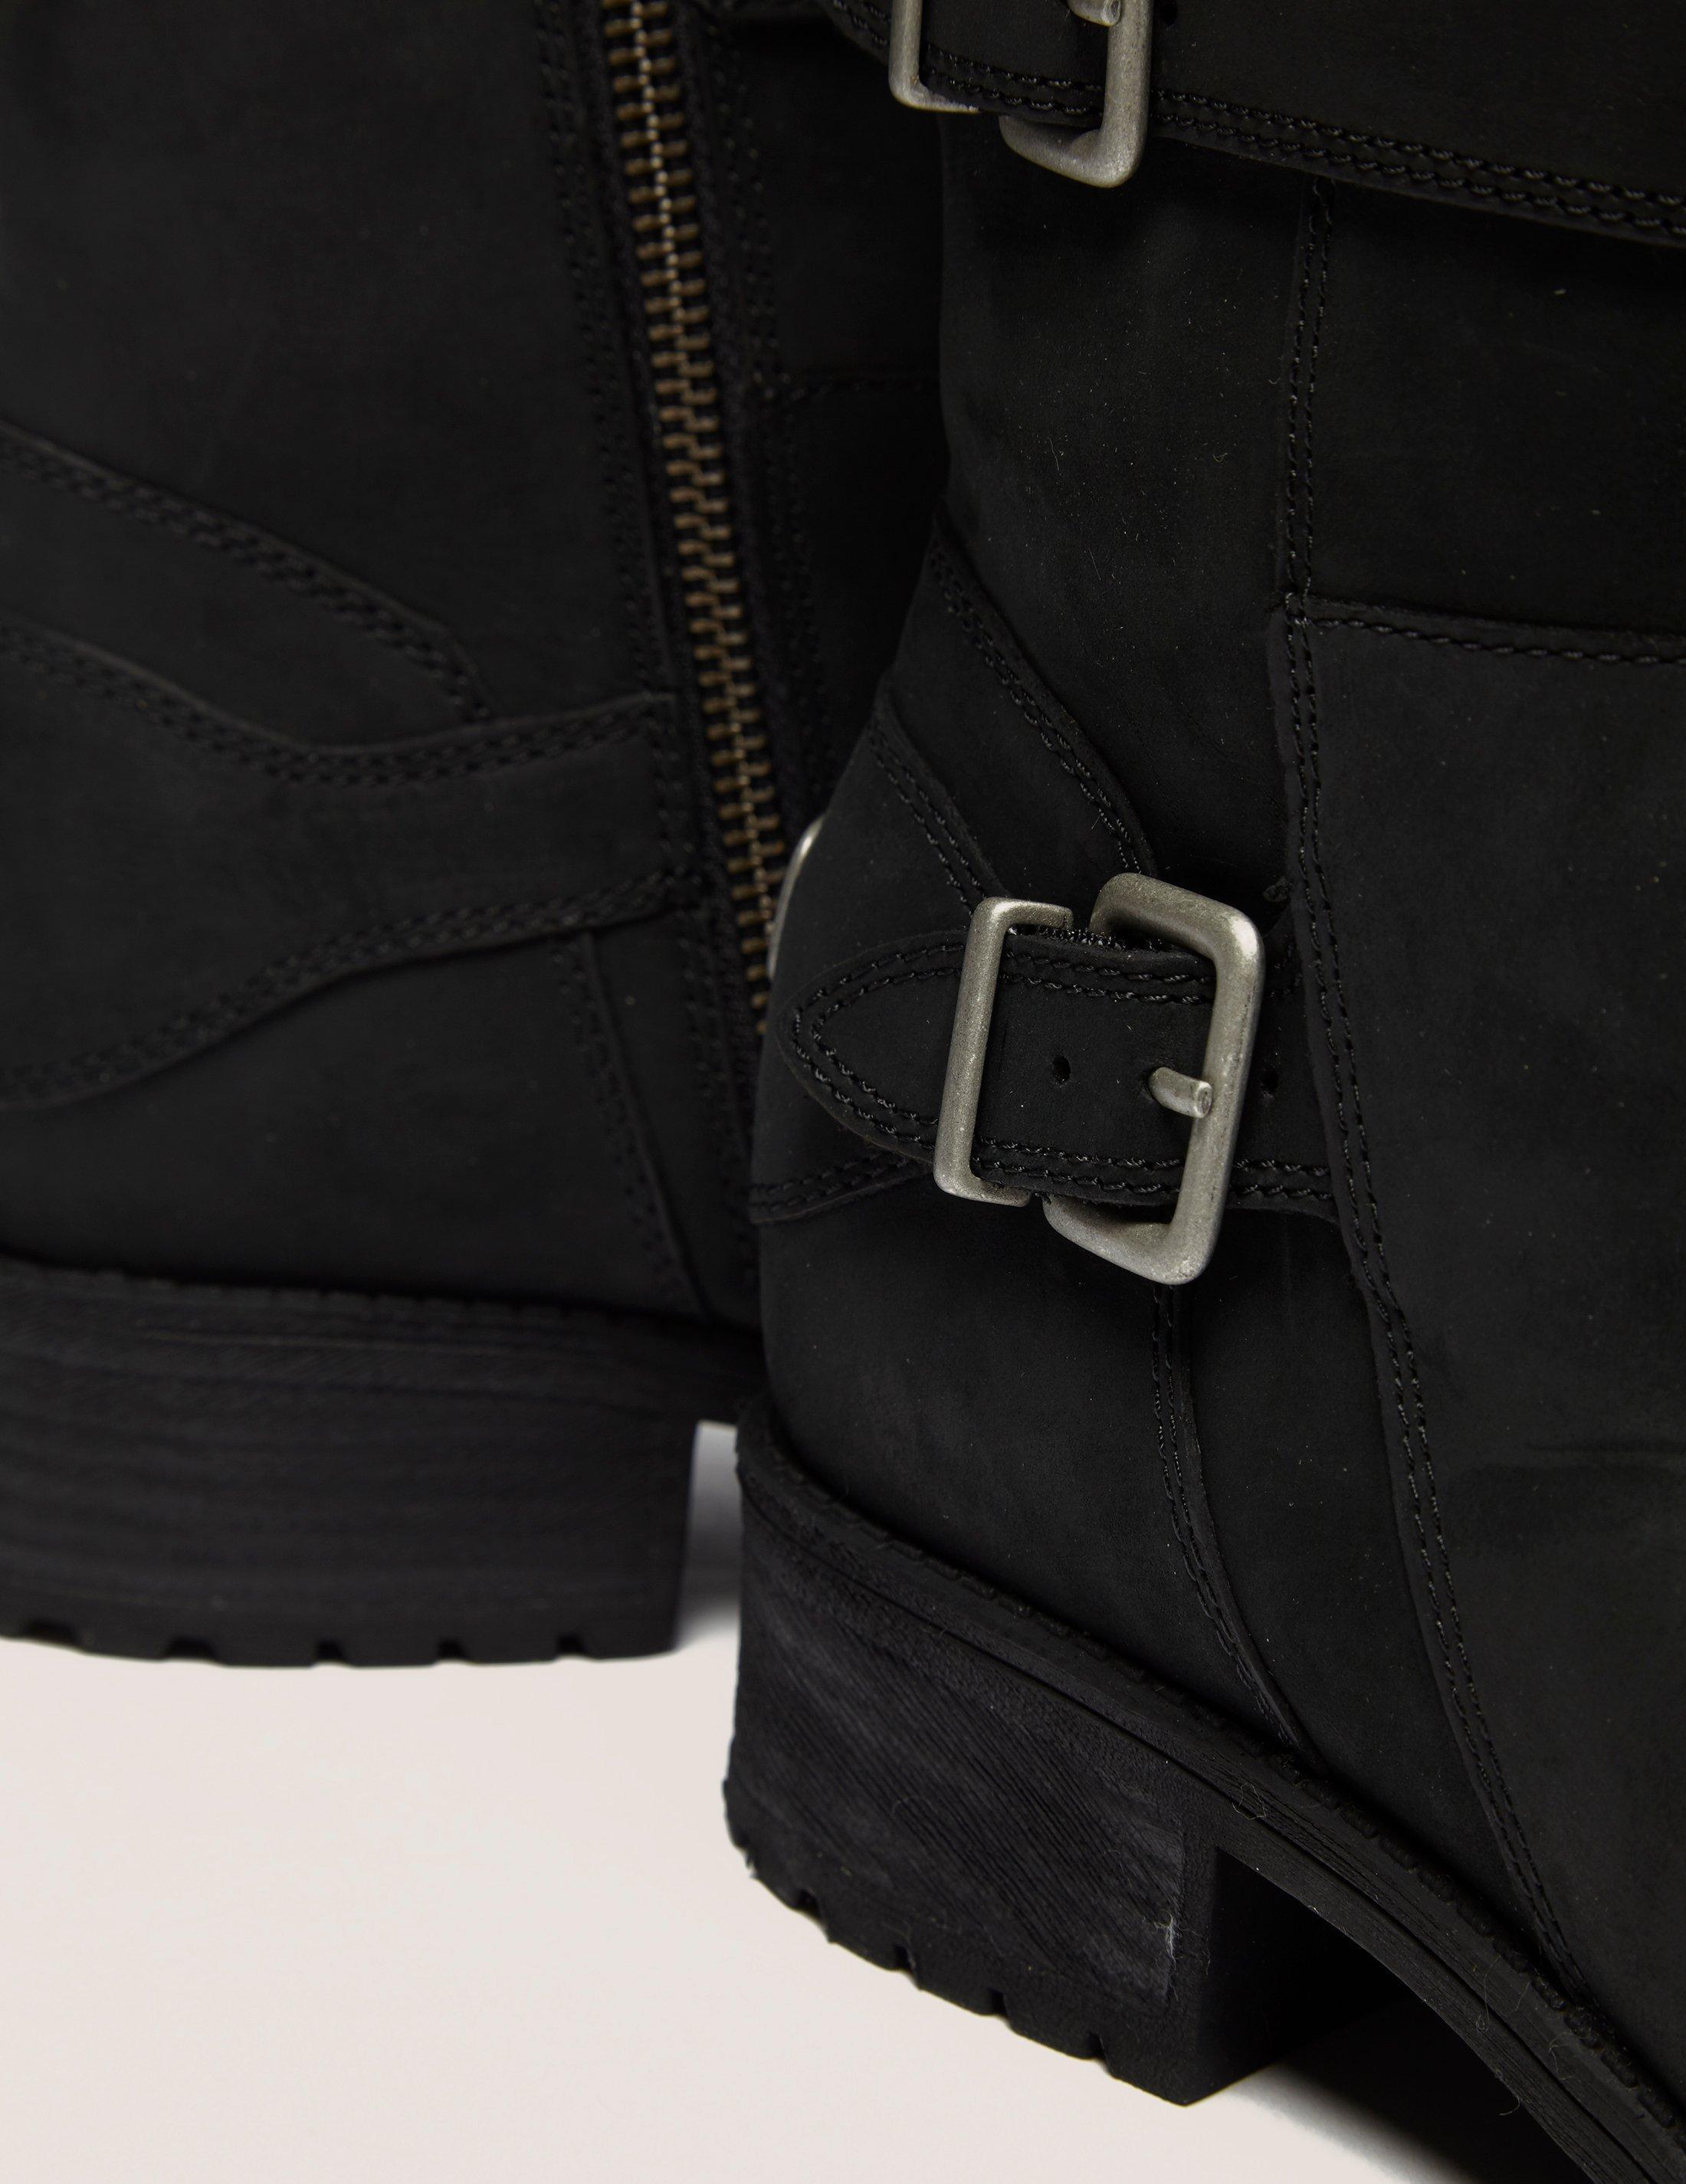 6201e567729 UGG Womens Wilcox Biker Boot Black in Black - Lyst